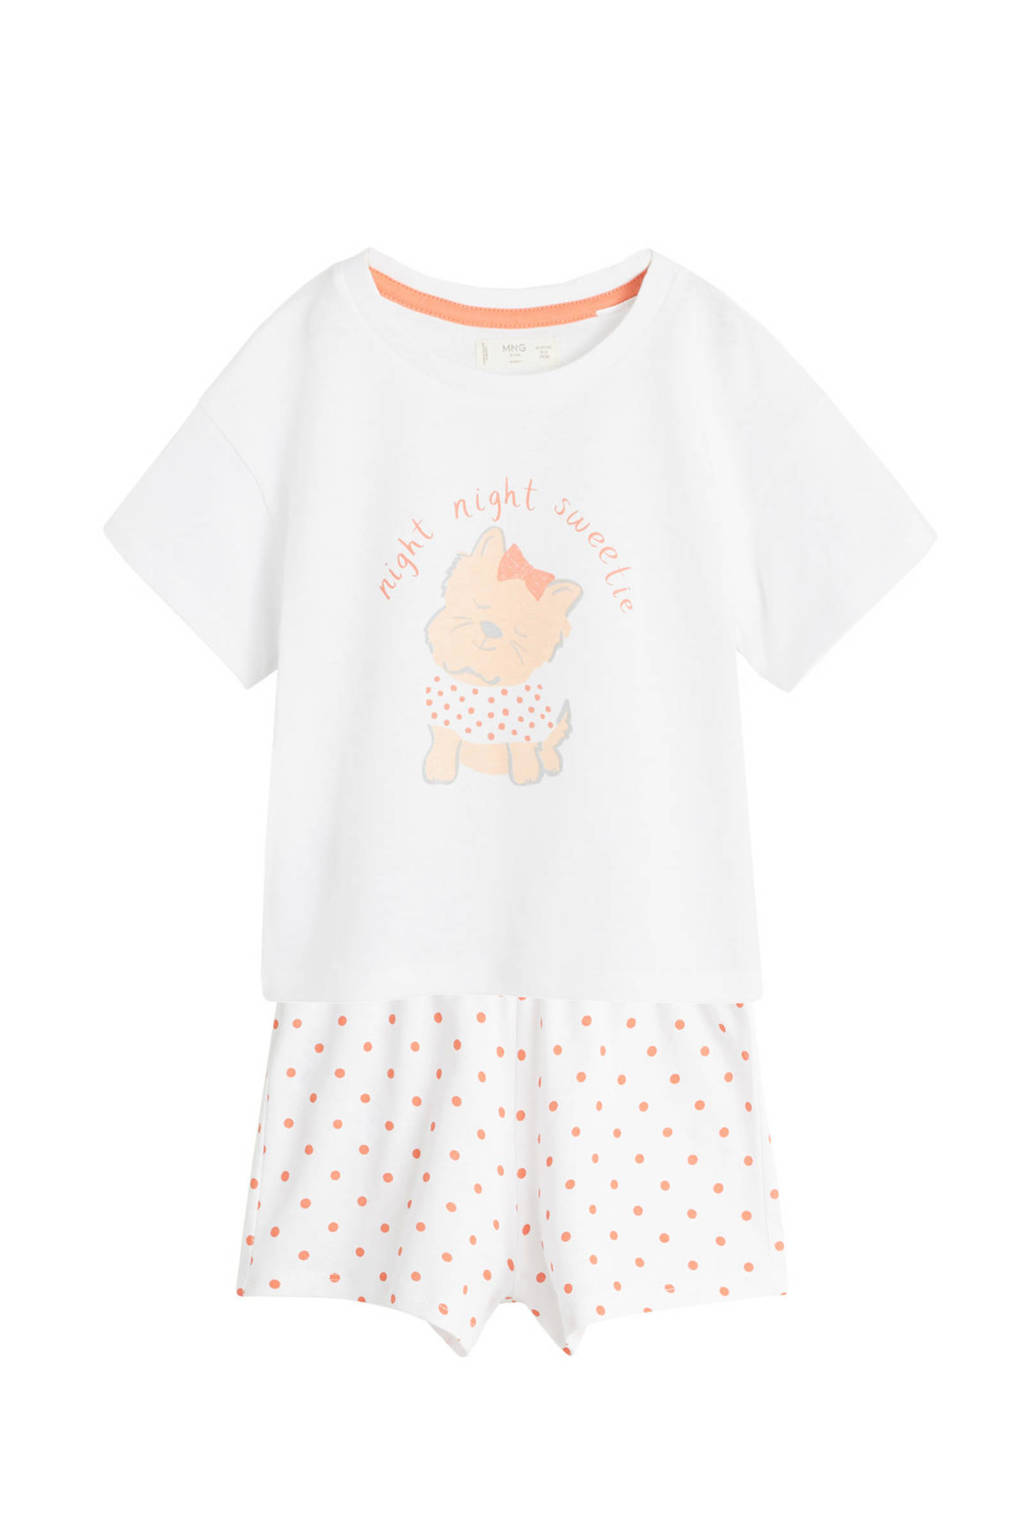 Mango Kids shortama met print wit/oranje, Wit/oranje